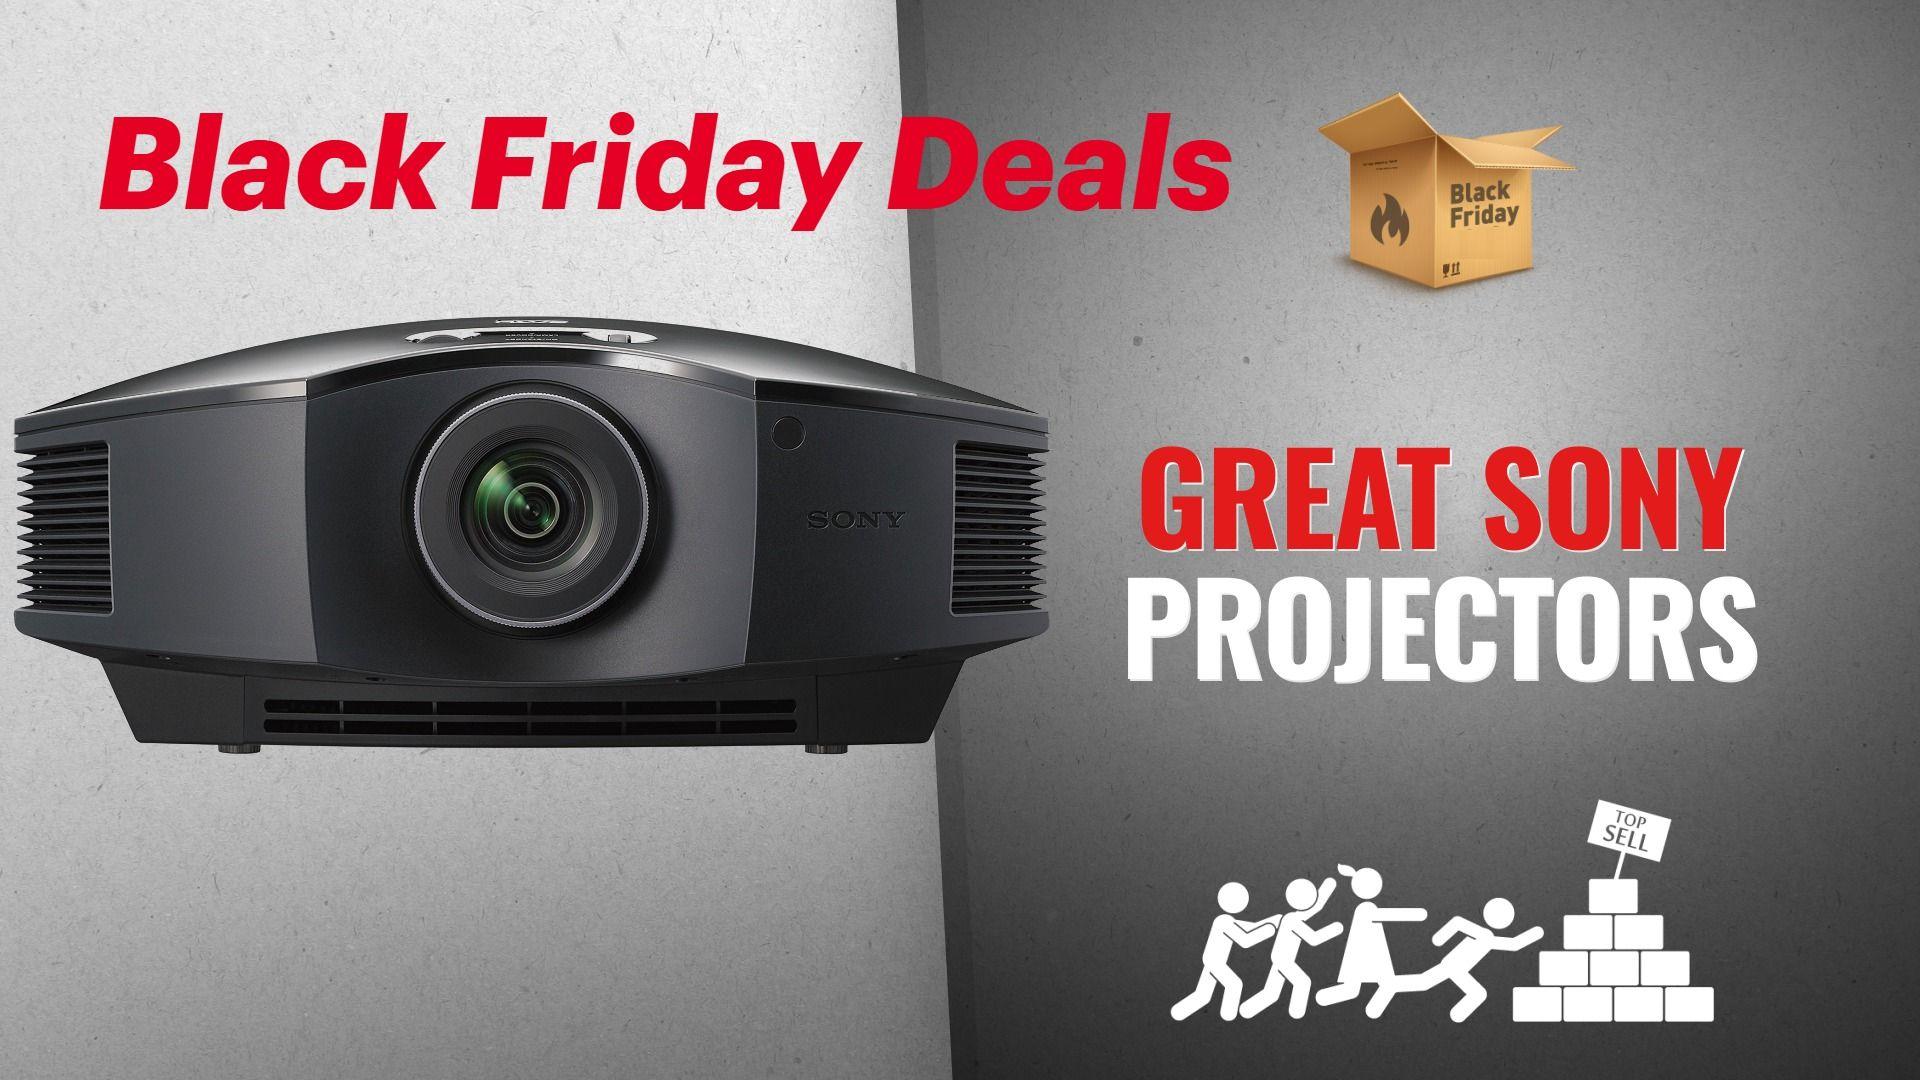 Sony Black Friday Deals 2020 Black Friday Projector Best Black Friday